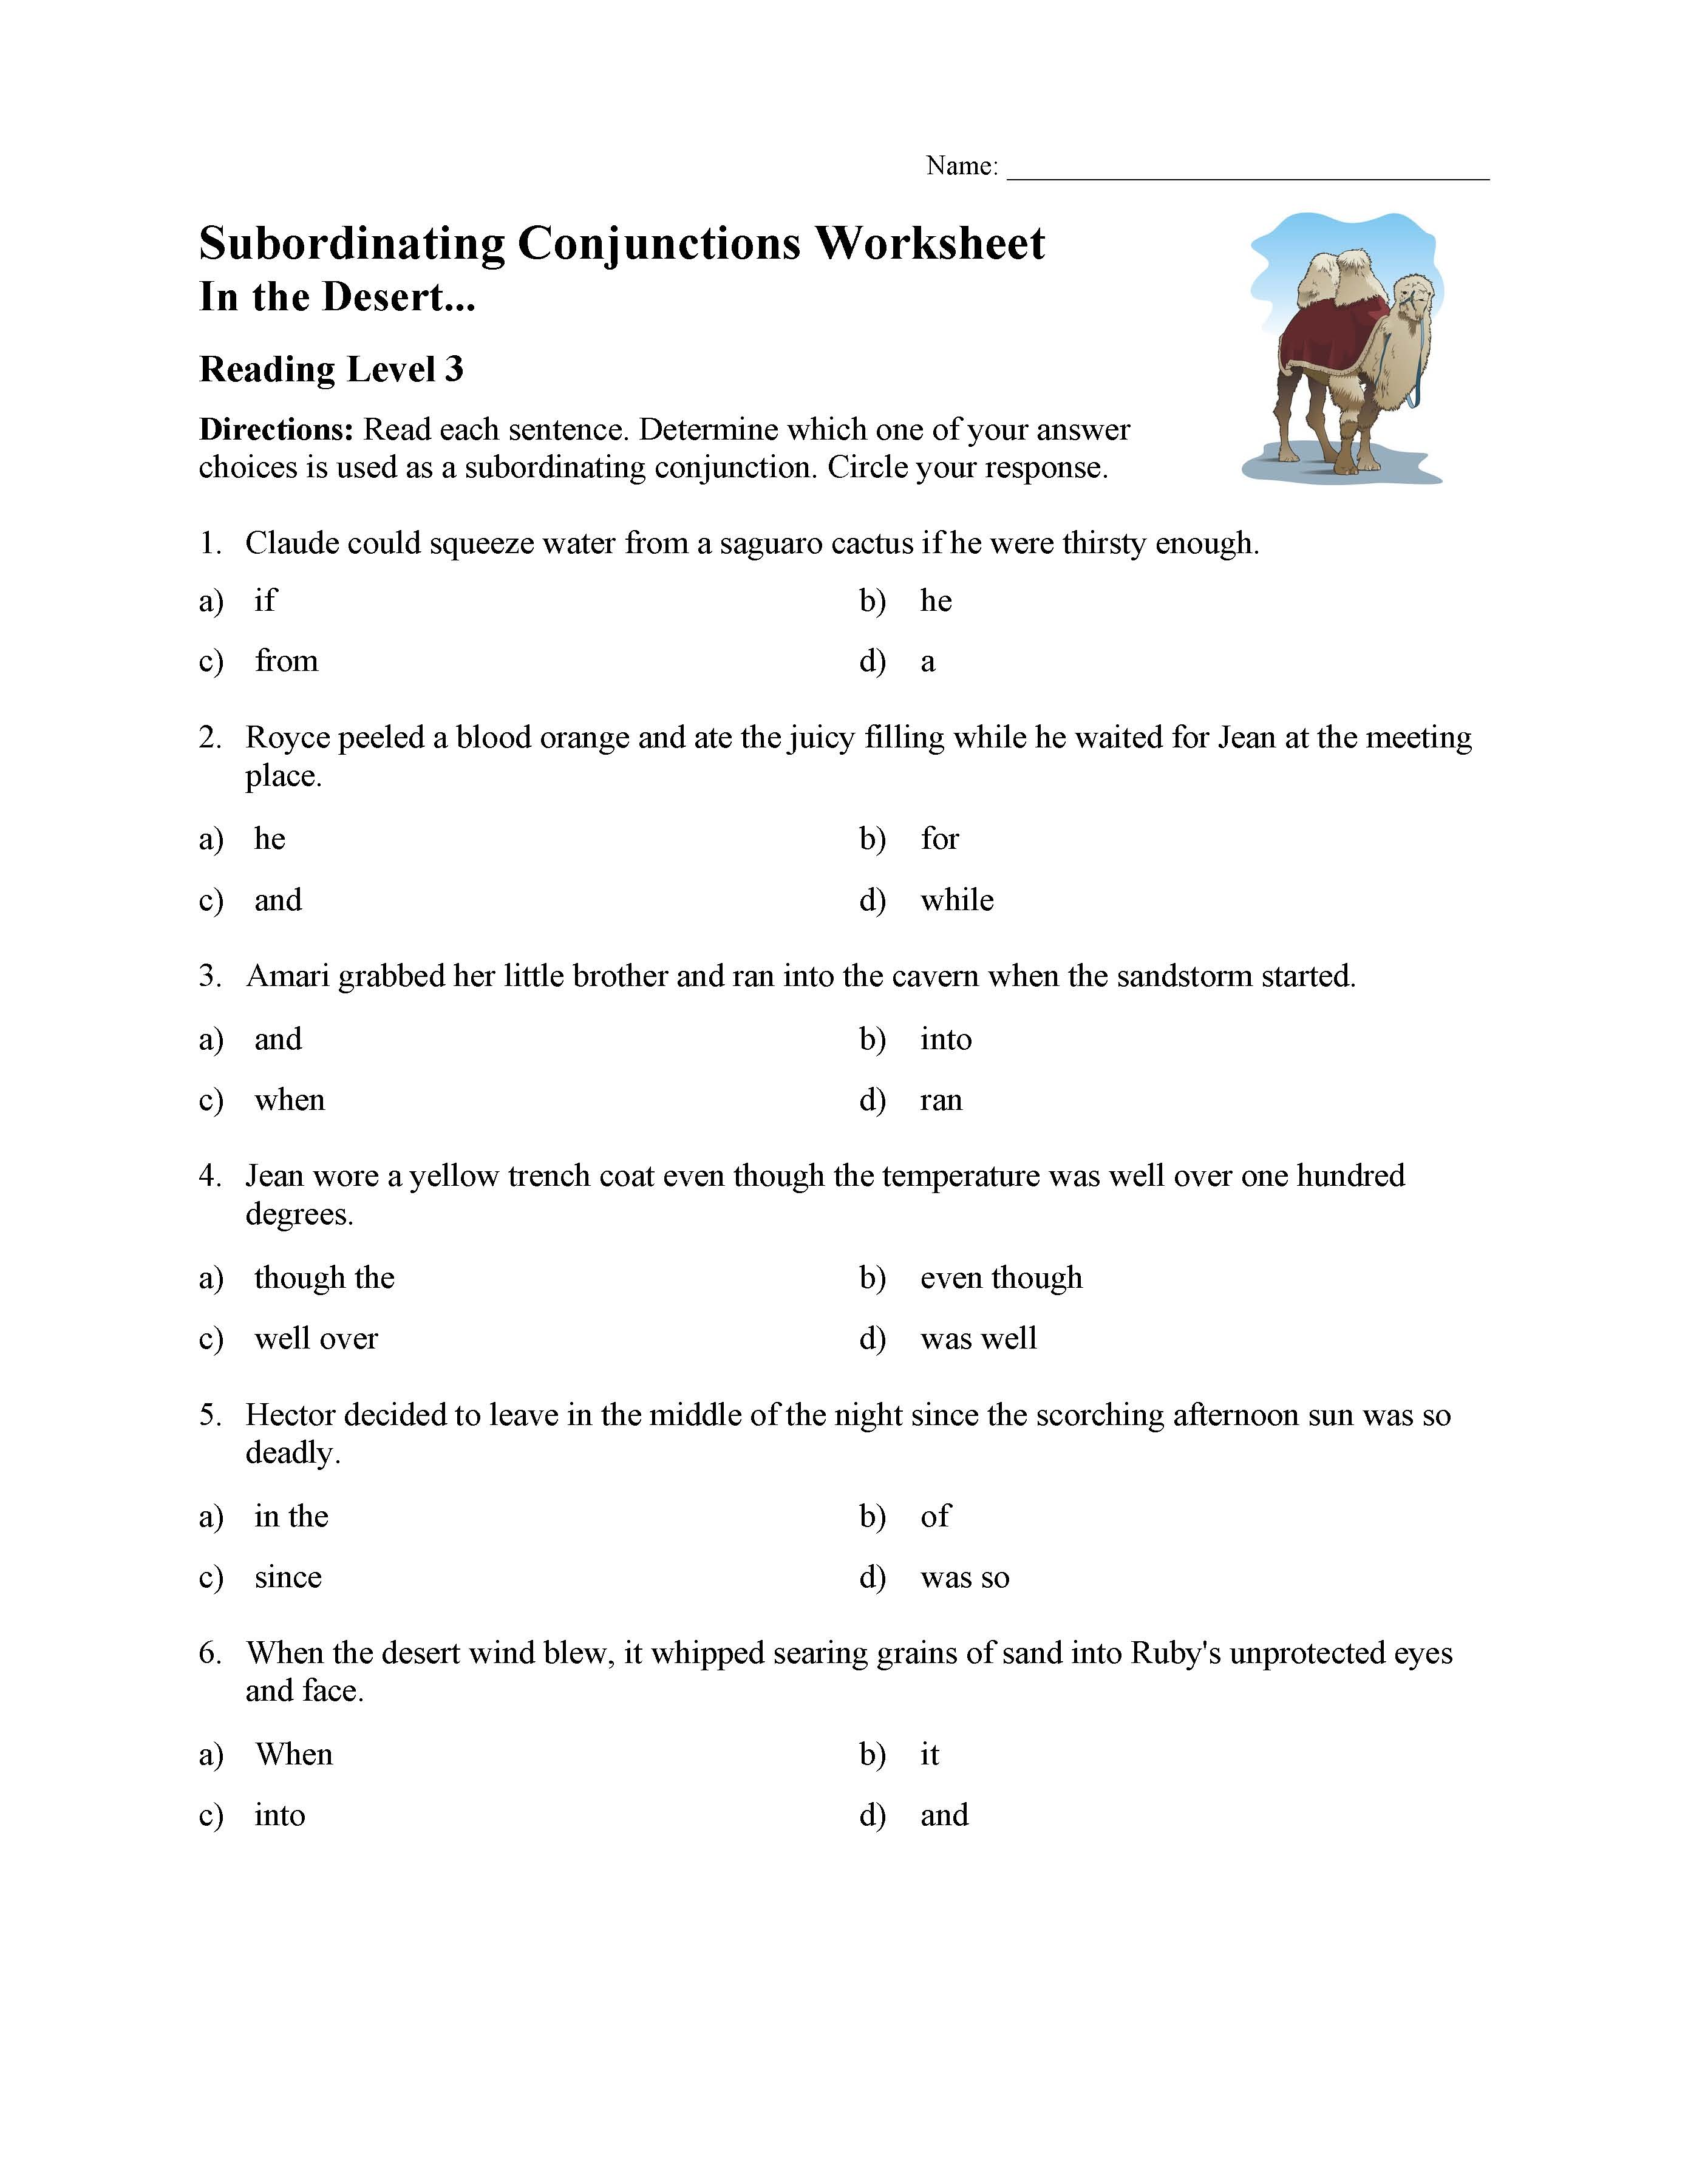 Subordinating Conjunctions Worksheet